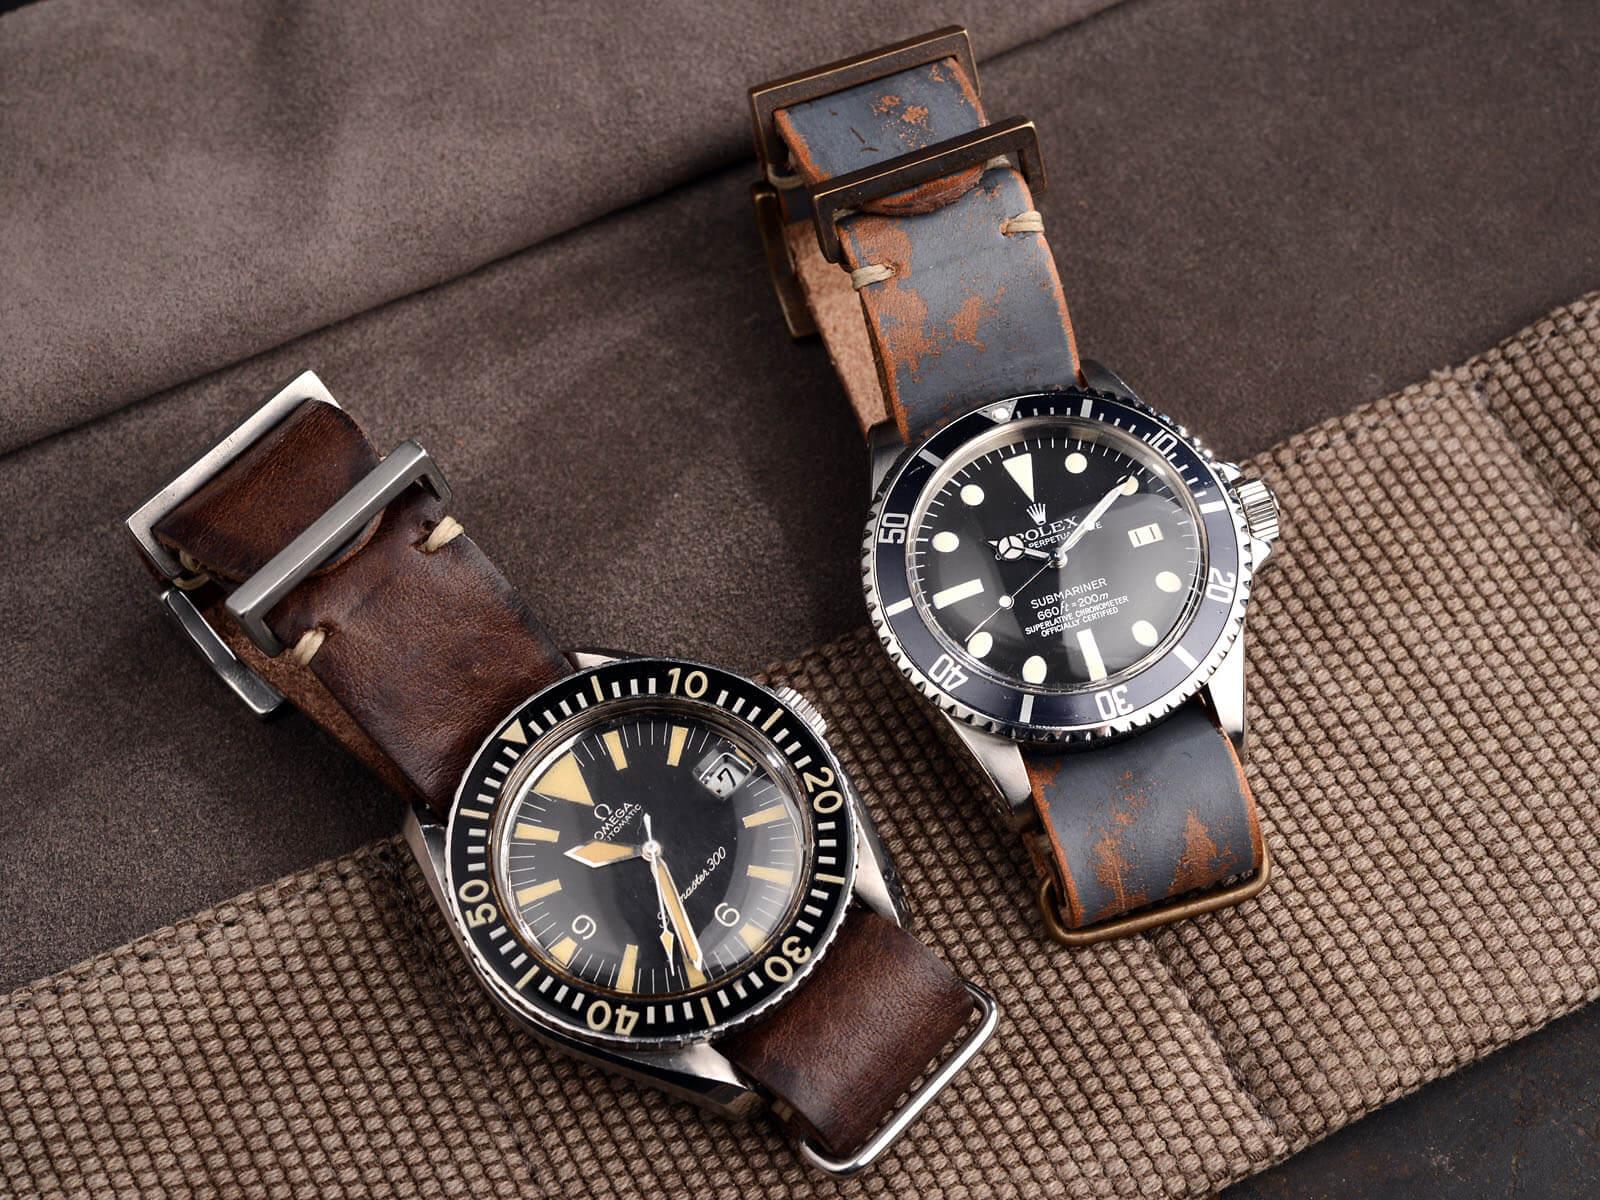 Nato vintage - klockarmband i äkta läder.